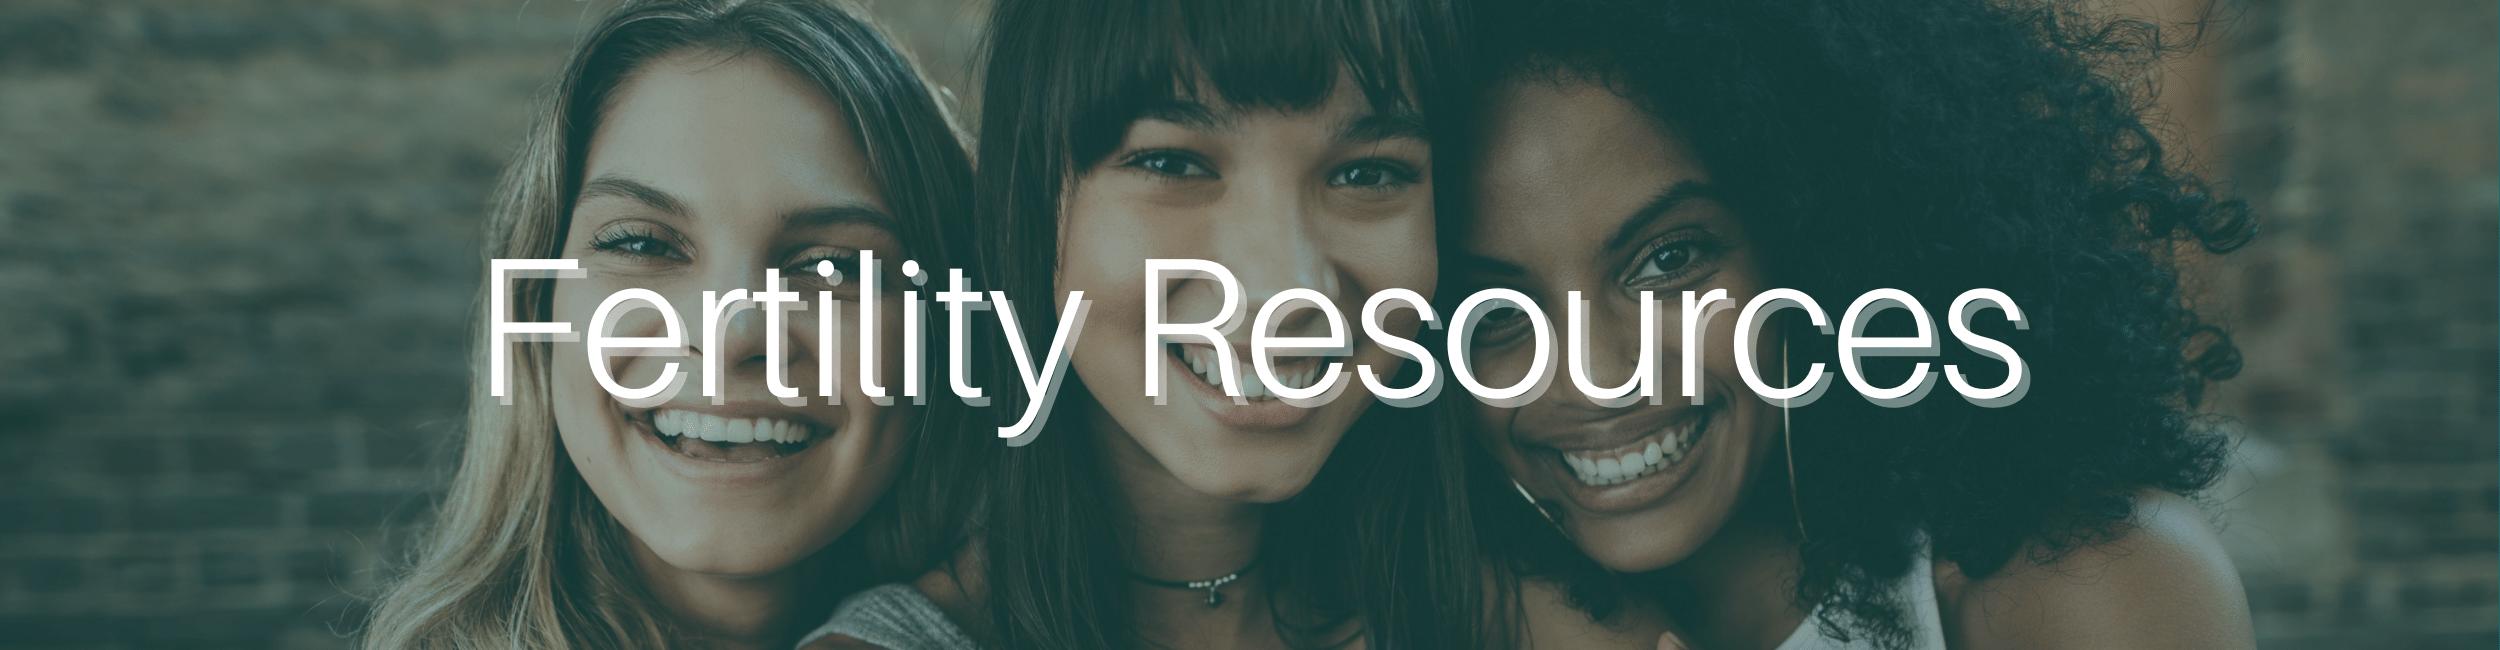 fertility resources nutrition acupuncture